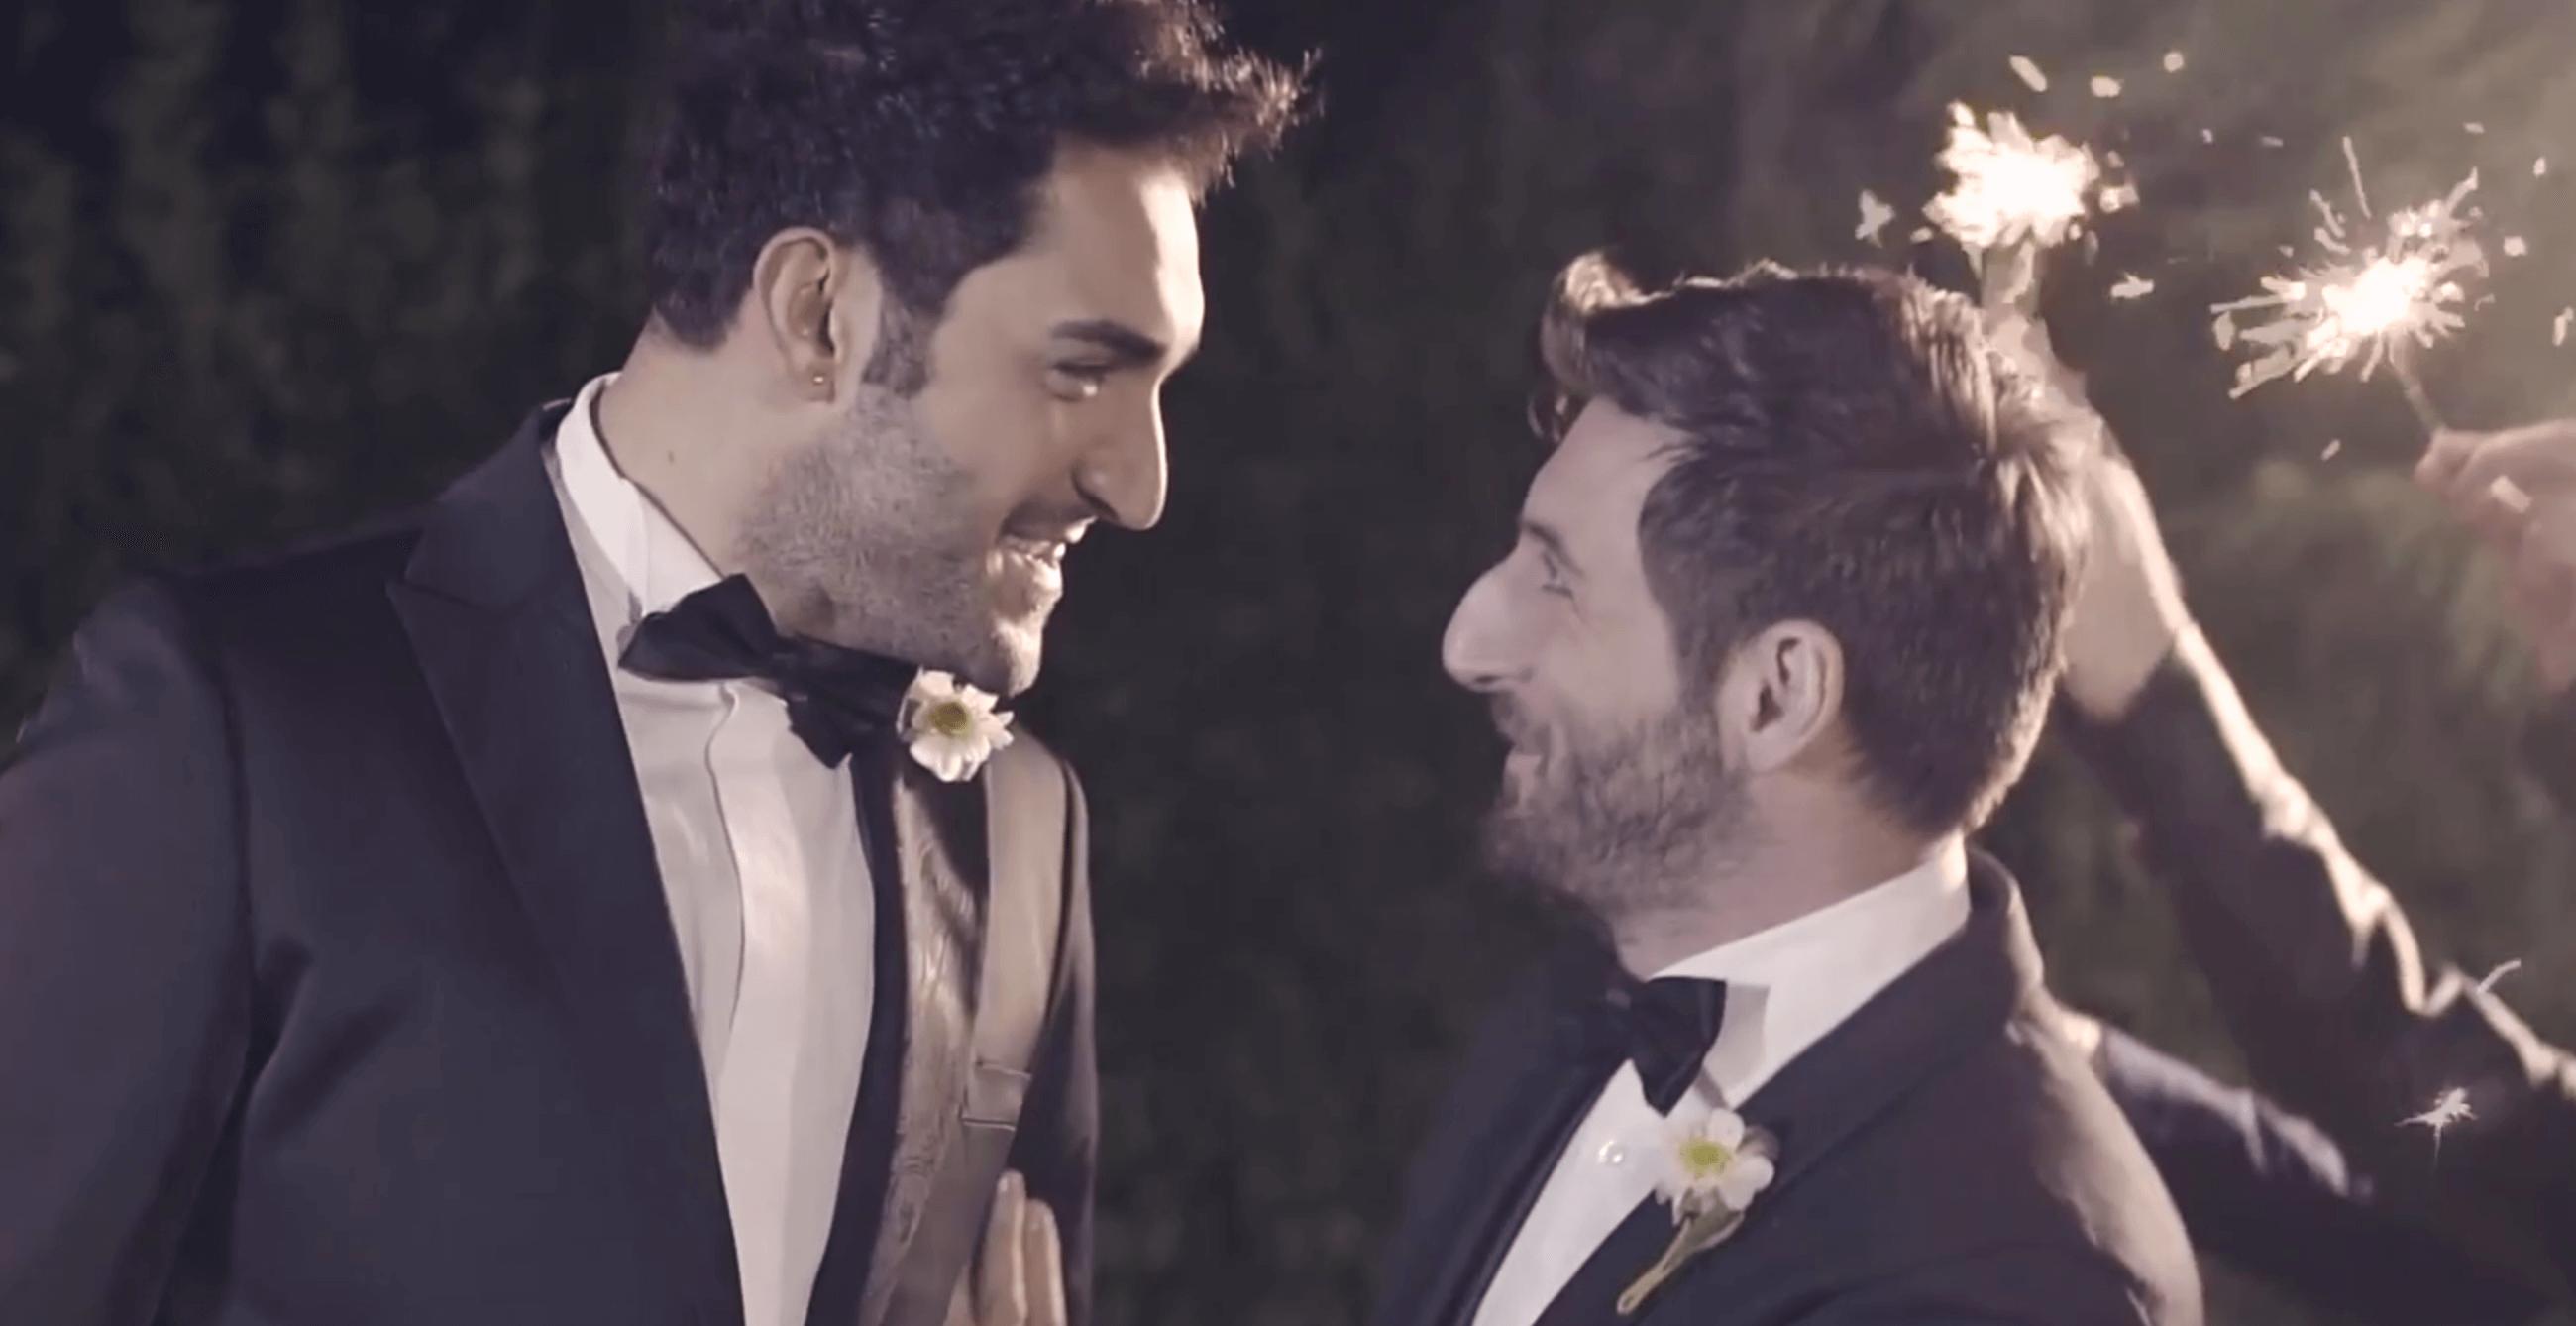 luna_palumbo_casomai_coppia_gay